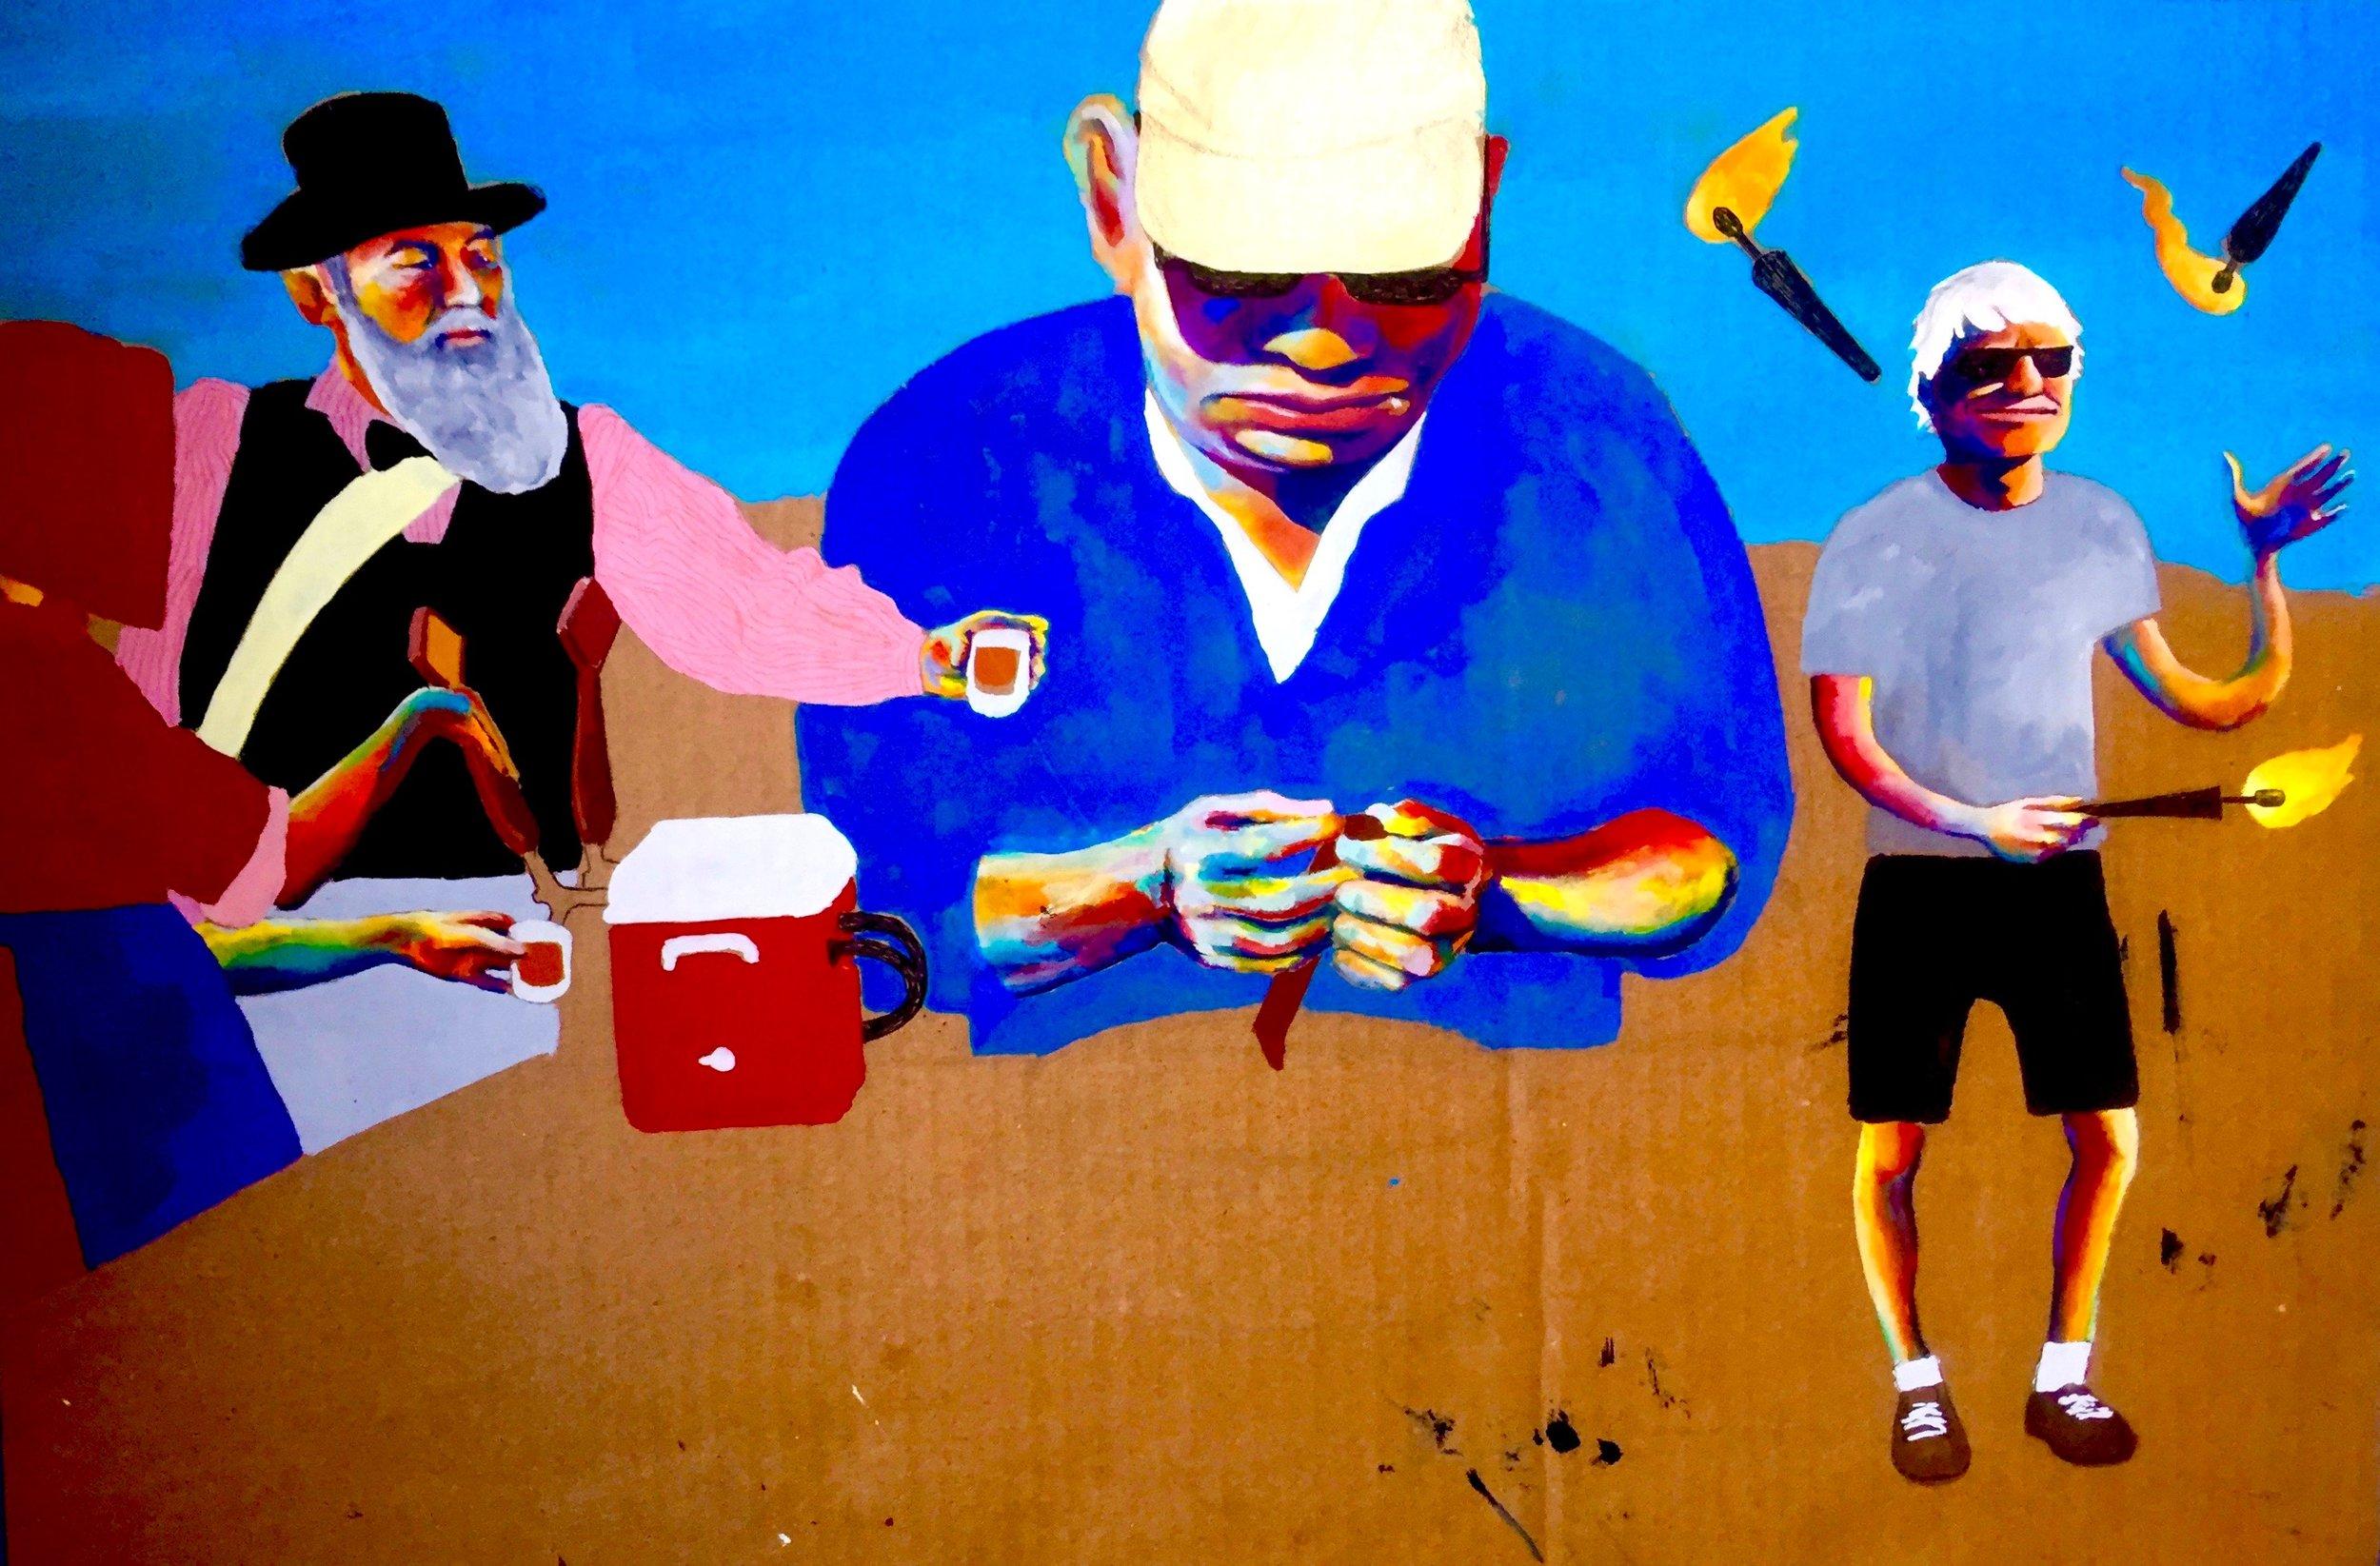 Festival of Ales 1/3 2015-x, gouache, micron pen & colored pencil